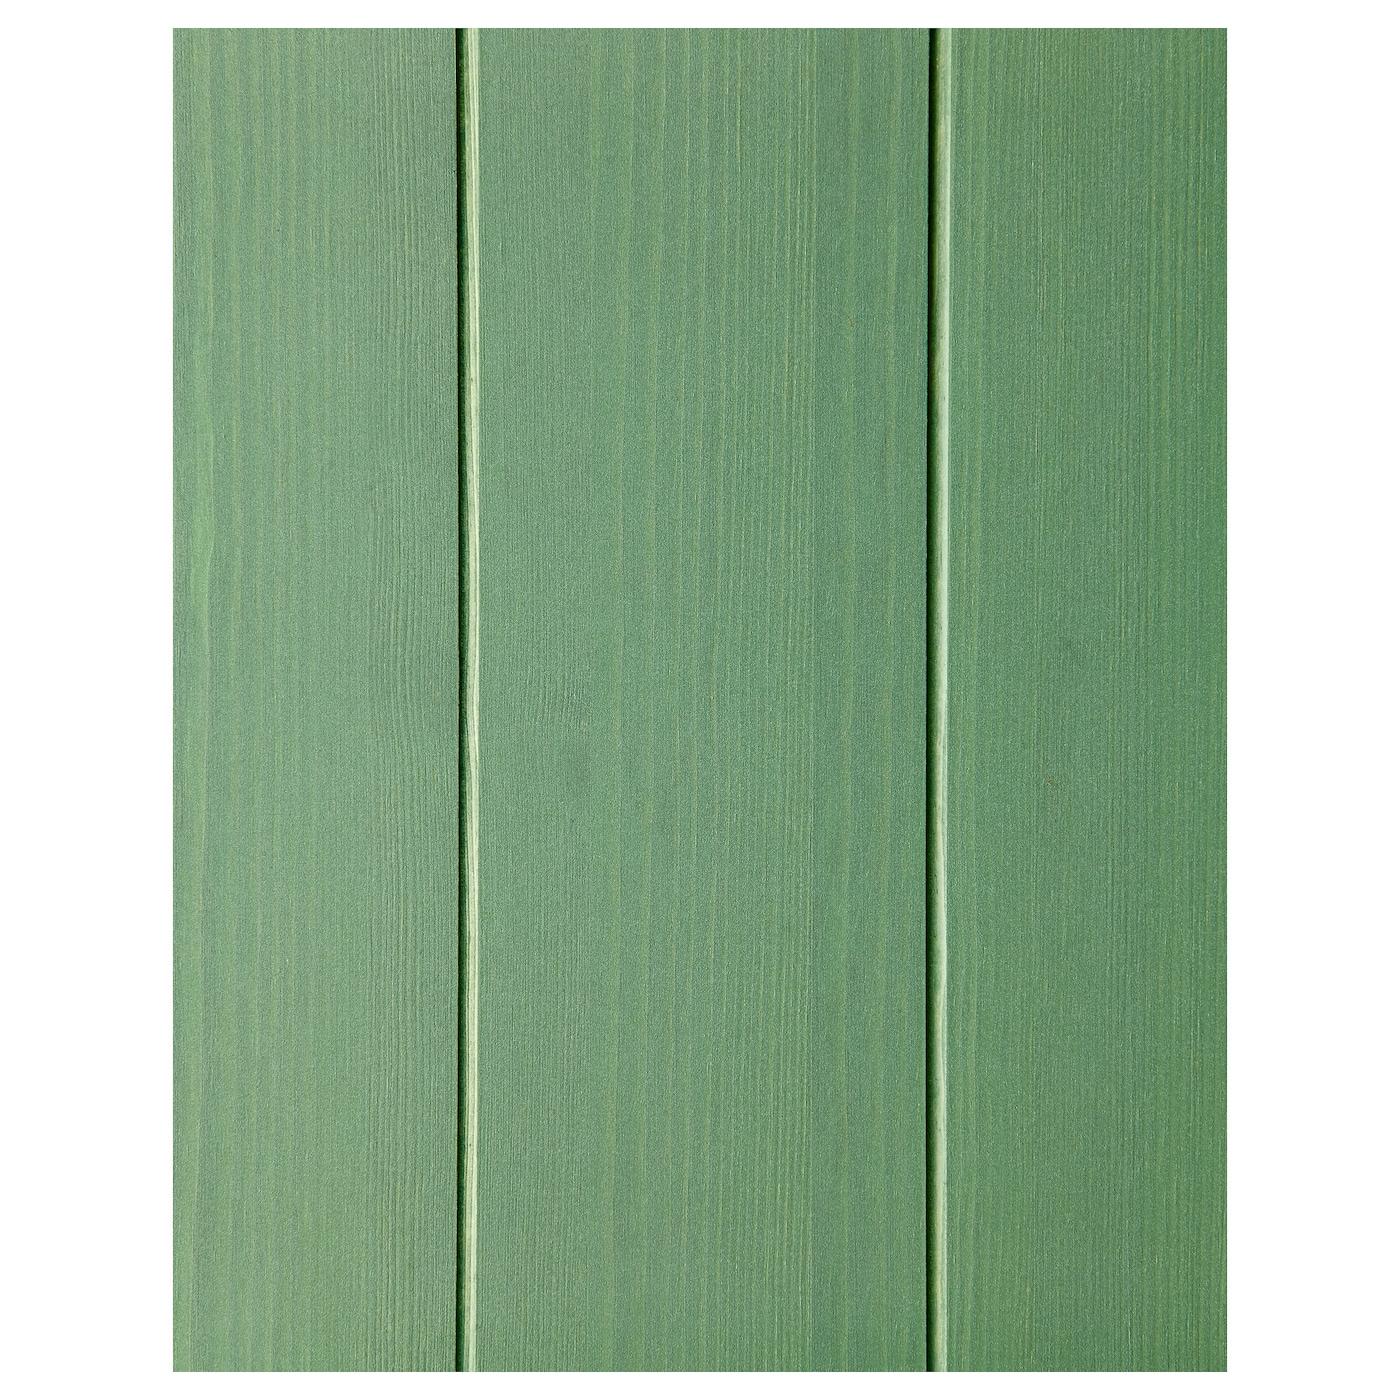 Hurdal armoire linge vert 109x50x137 cm ikea - Ikea armoire a linge ...